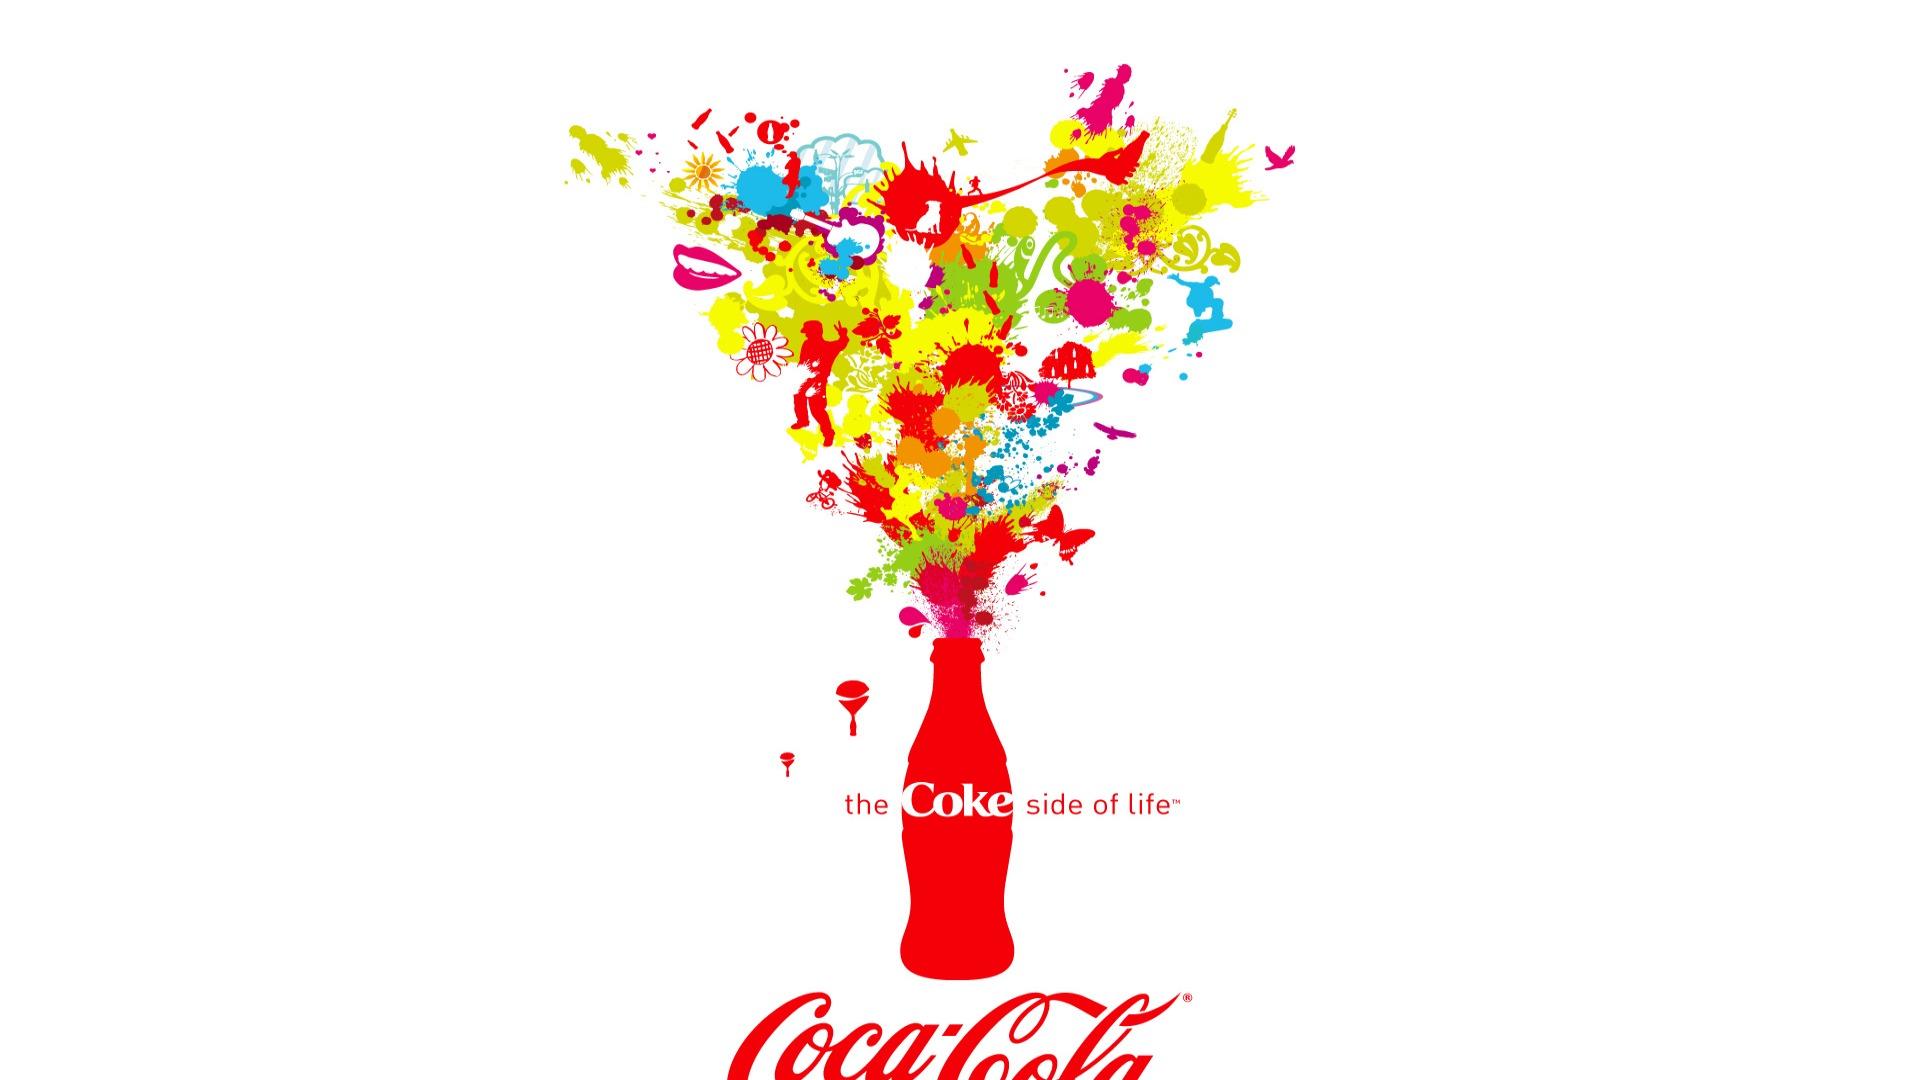 Coca Cola Wallpaper Brands Other Wallpapers in jpg format ... | 1920 x 1080 jpeg 273kB